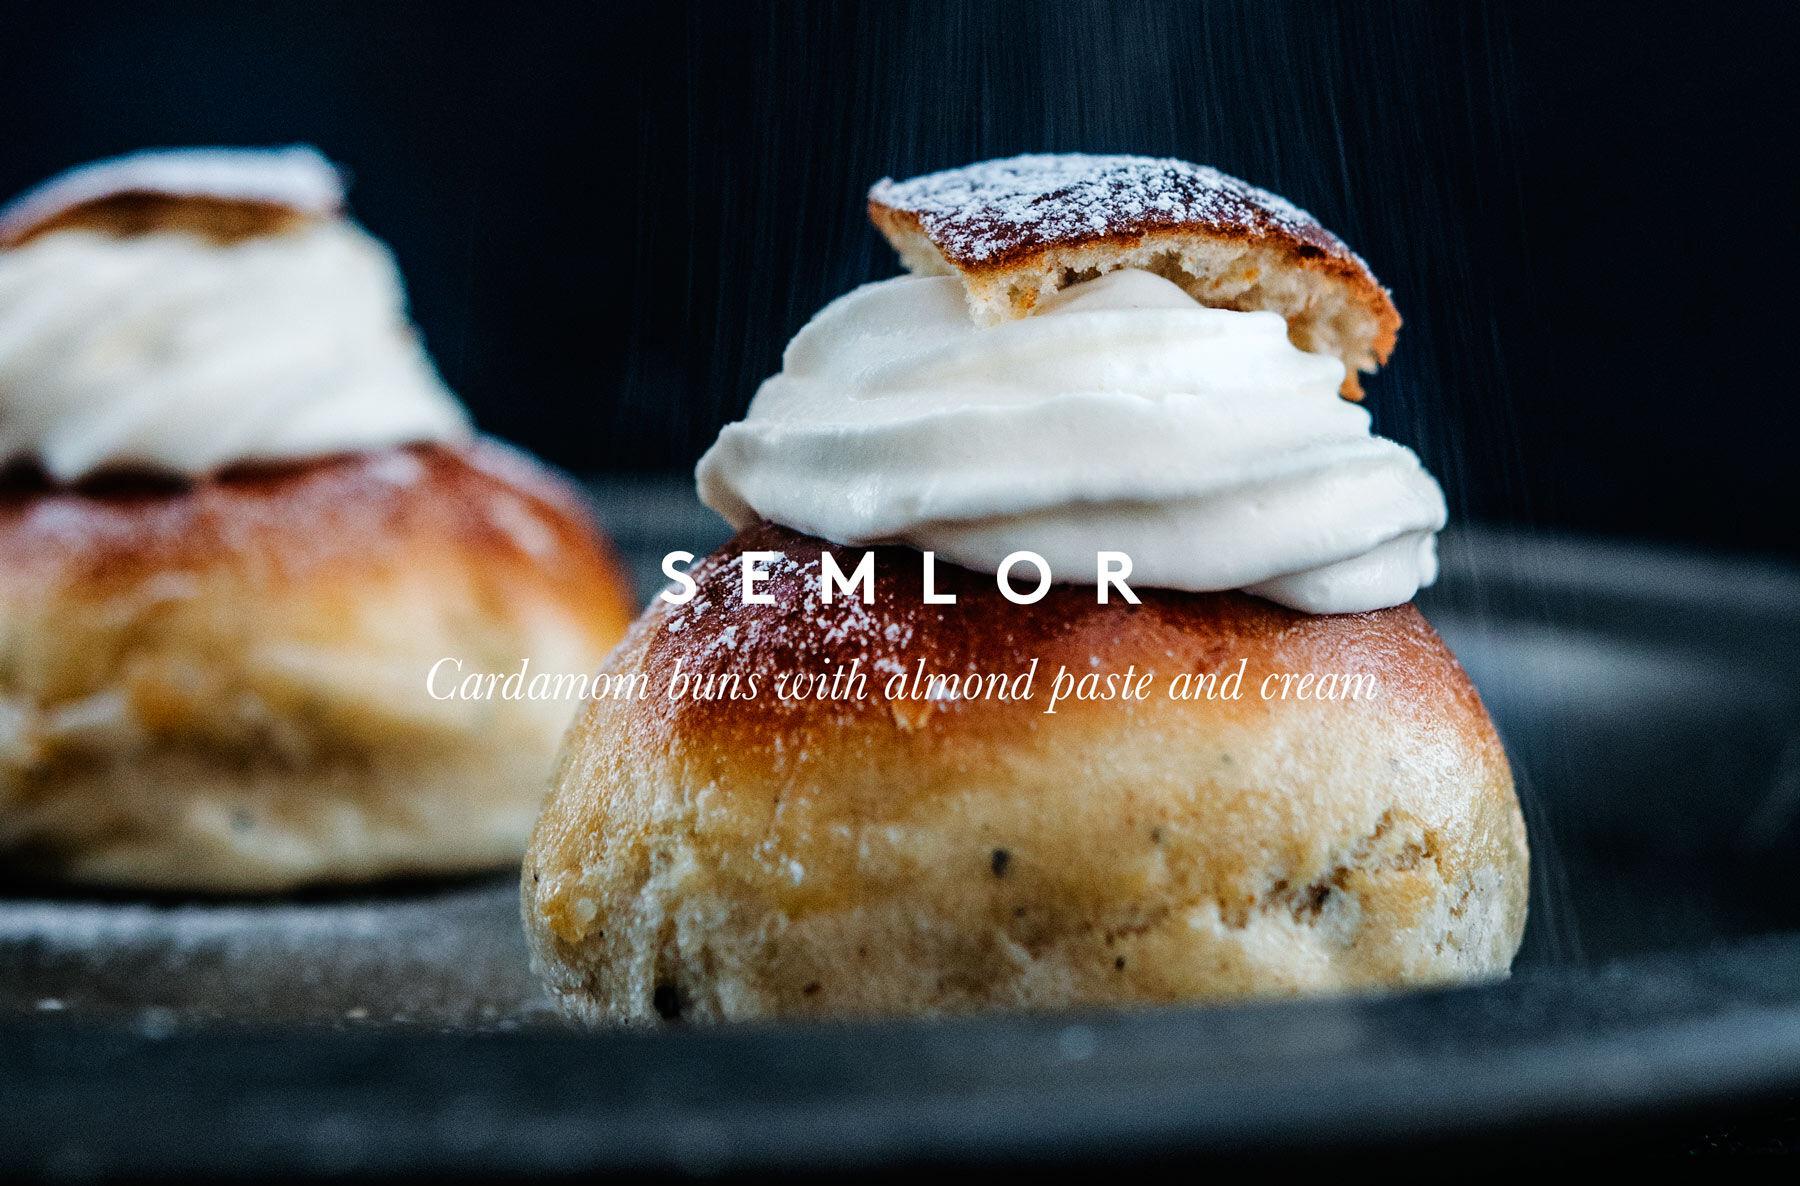 Semlor-recipe-petter_backlund_ploppestable